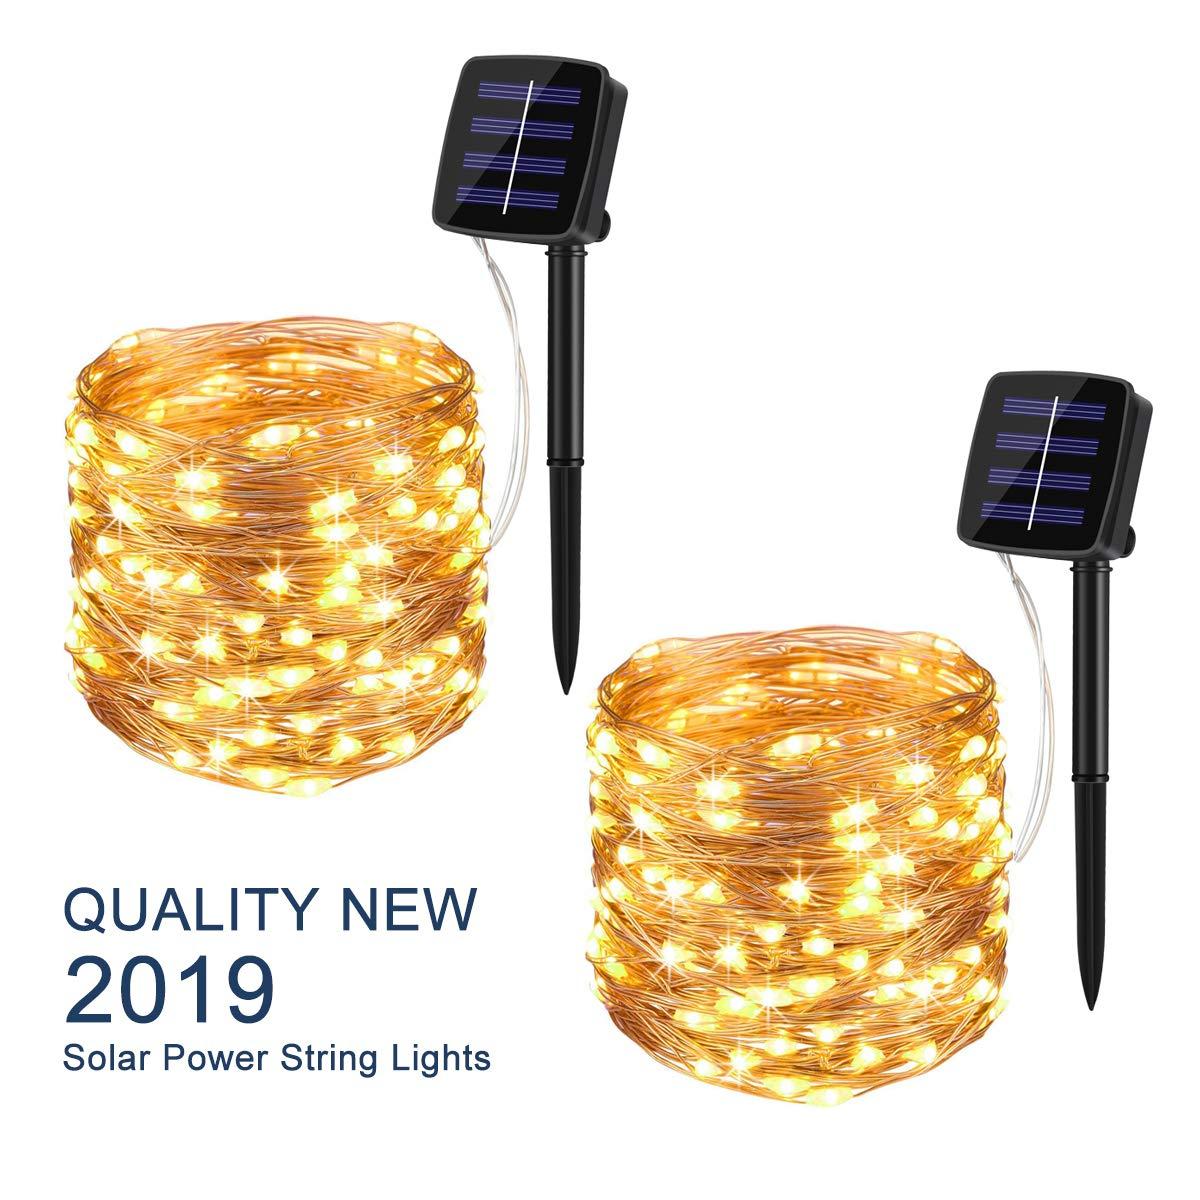 Guirnaldas de luces alimentadas por energía Solar de Navidad para exteriores, luz 72ft 200 guirnaldas de luces LED para Patio, jardín, Patio, fiesta, decoración de boda